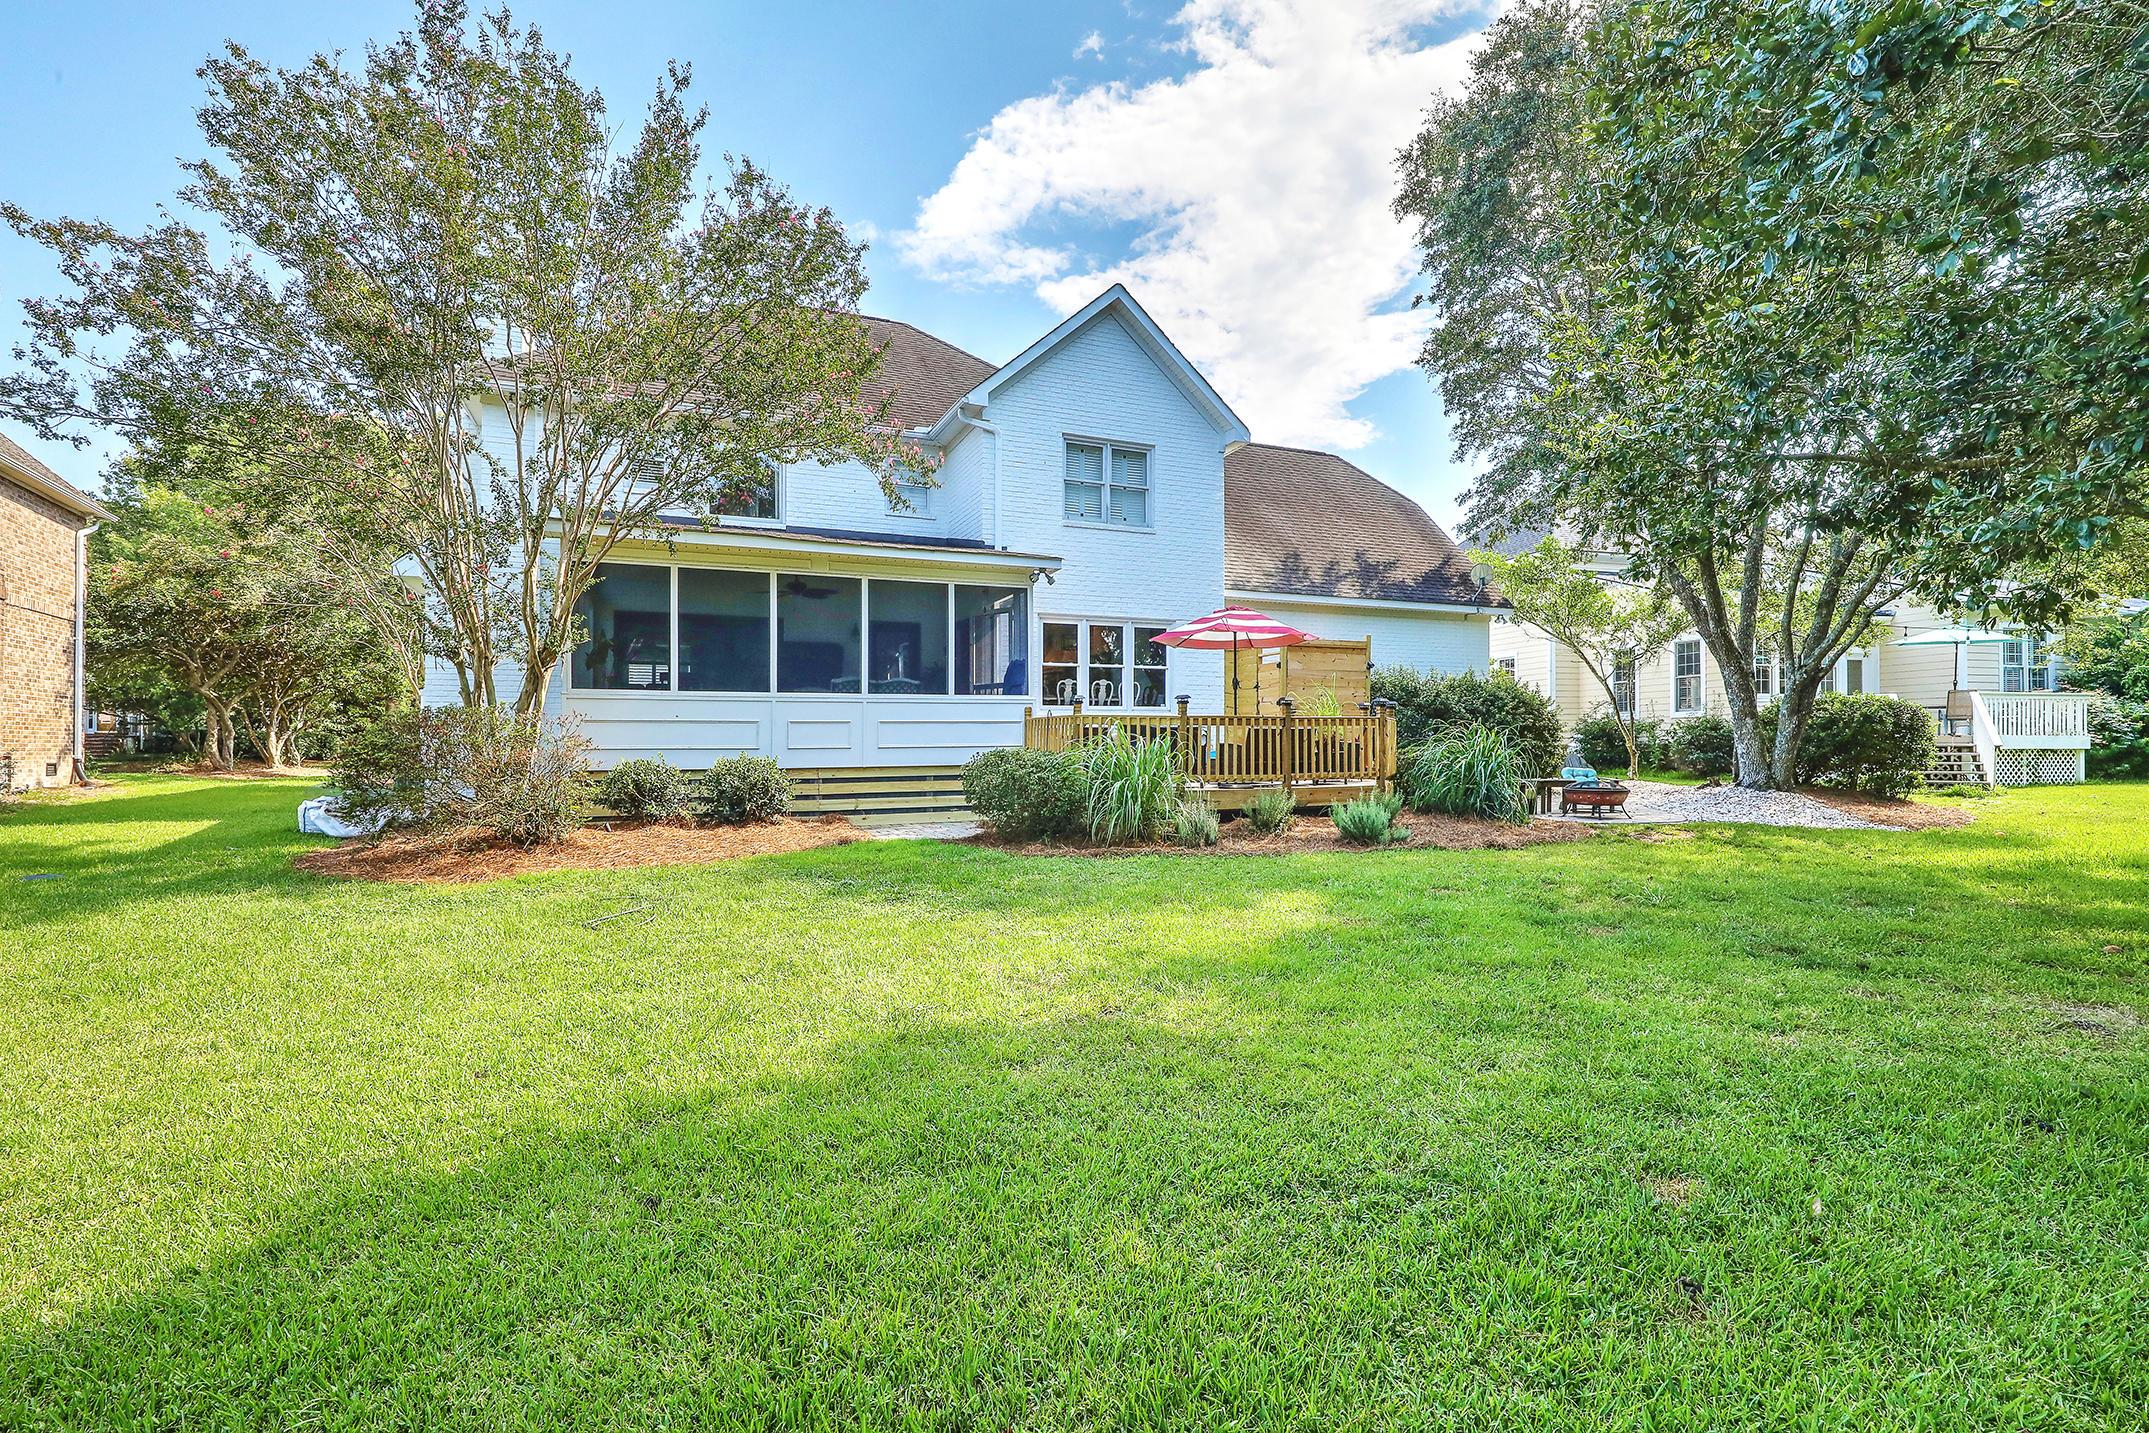 Hobcaw Creek Plantation Homes For Sale - 619 Palisades, Mount Pleasant, SC - 70